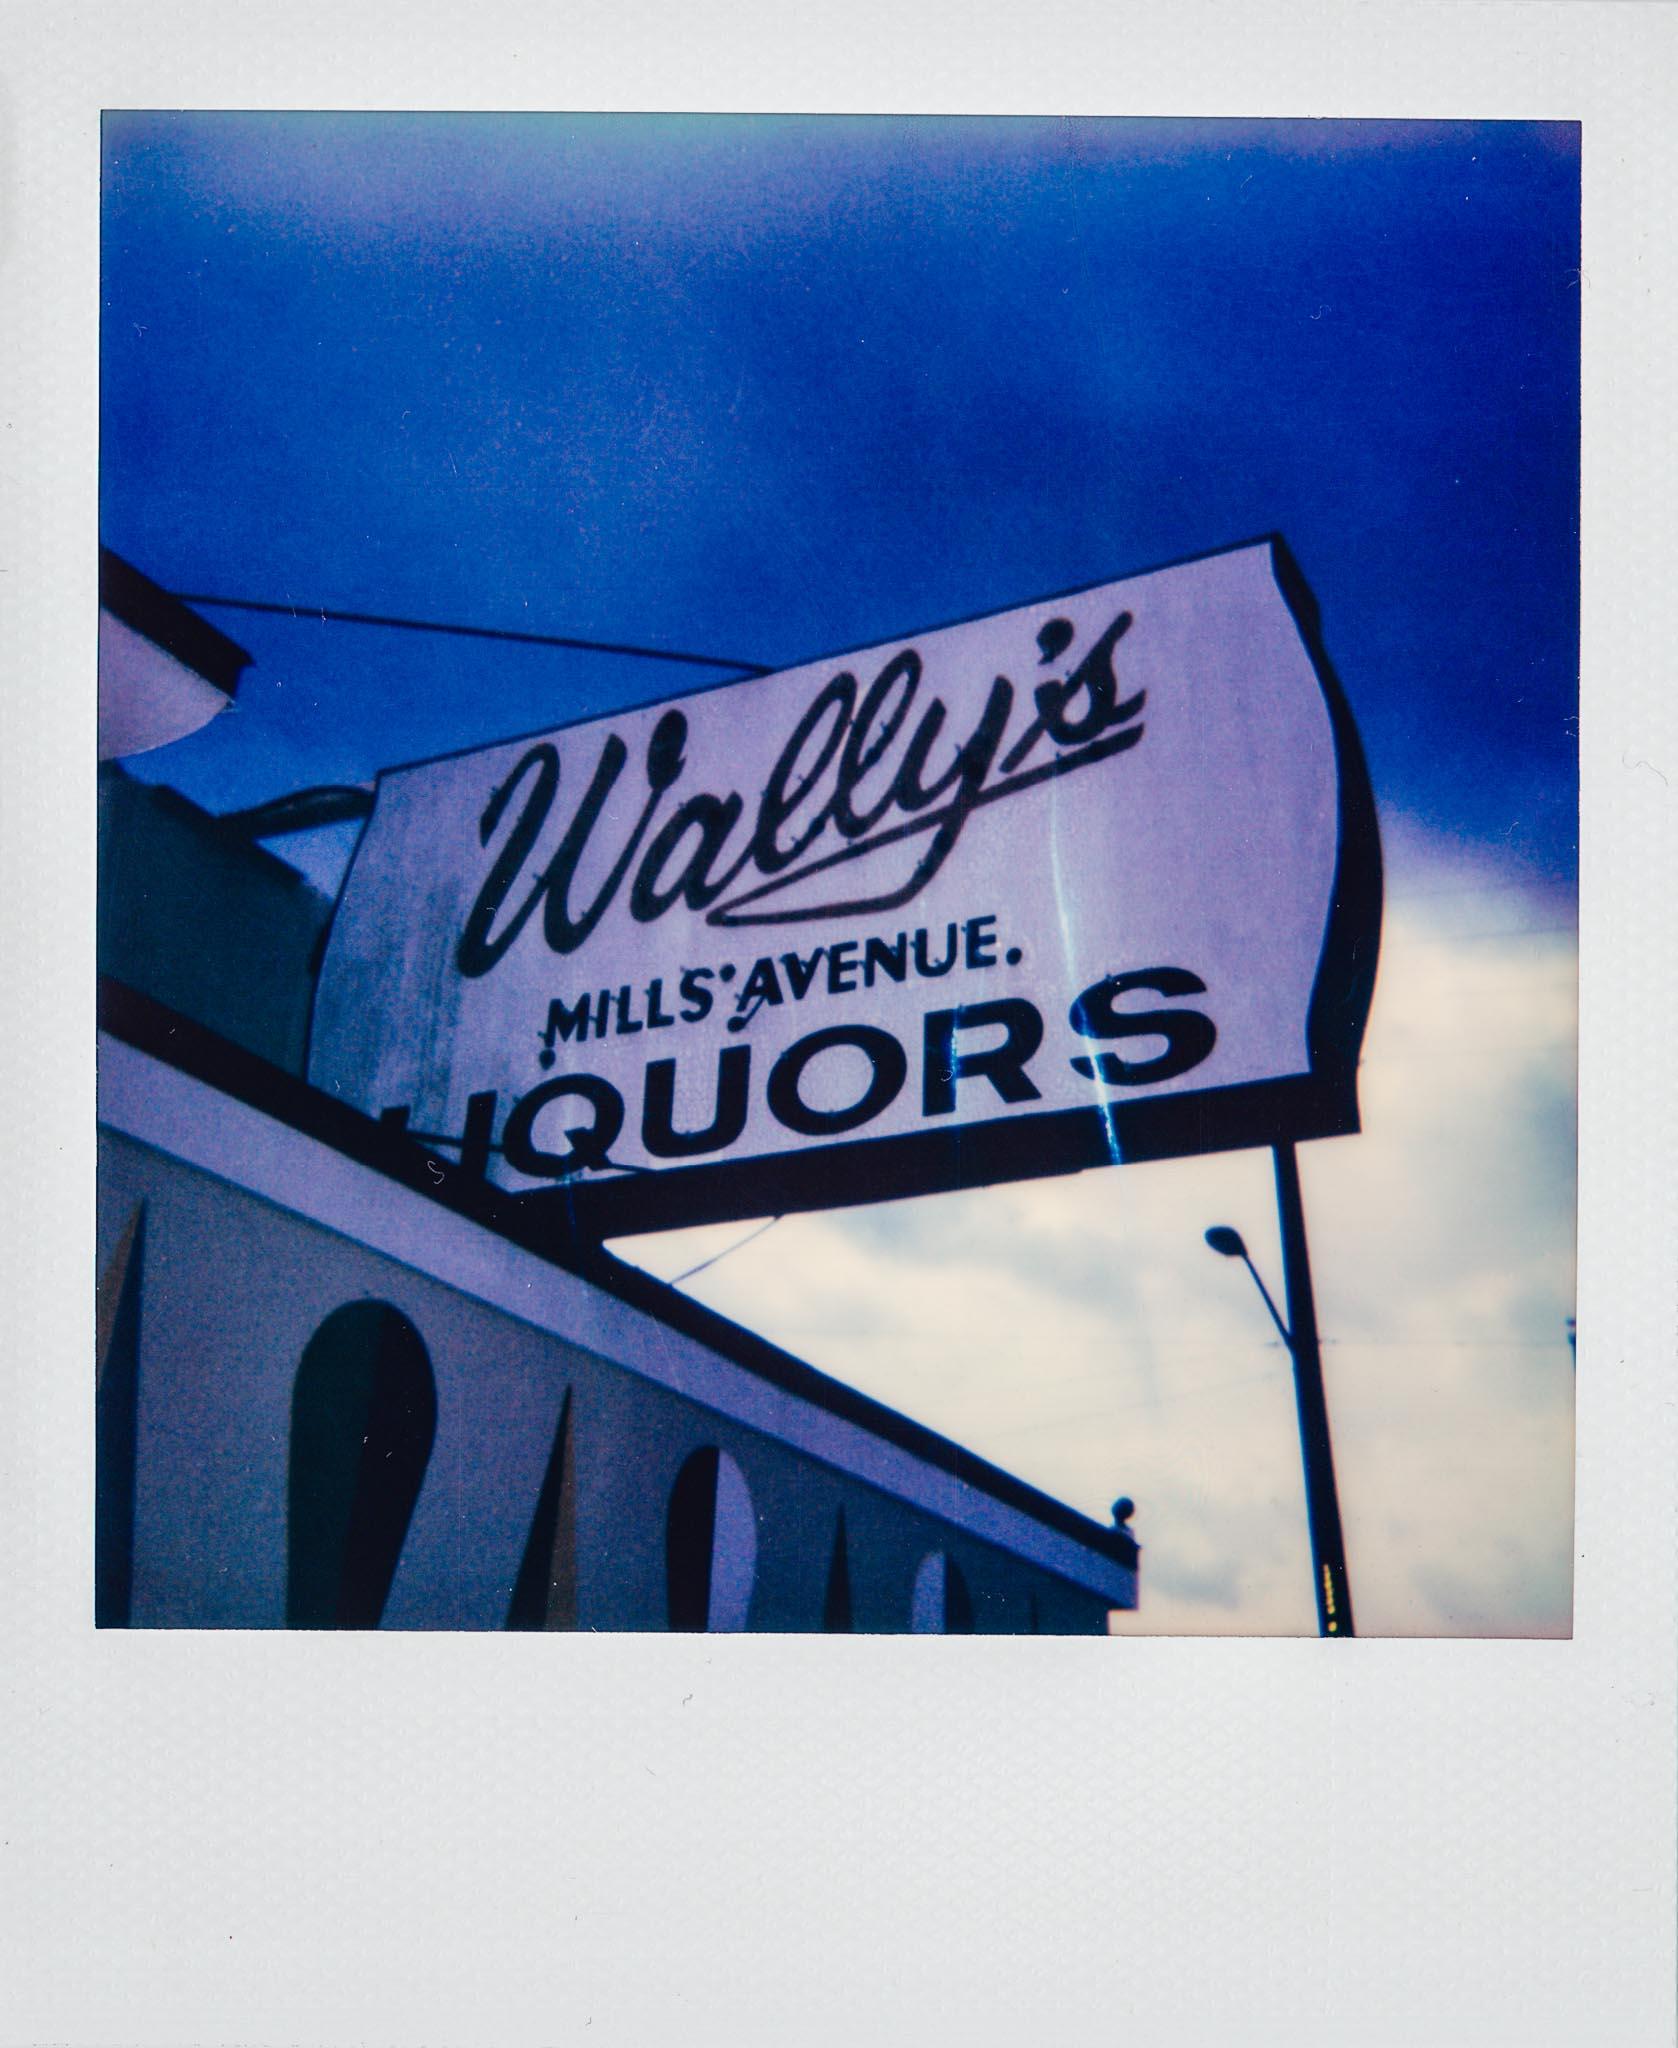 wallys-mills-avenue-polaroid.jpg